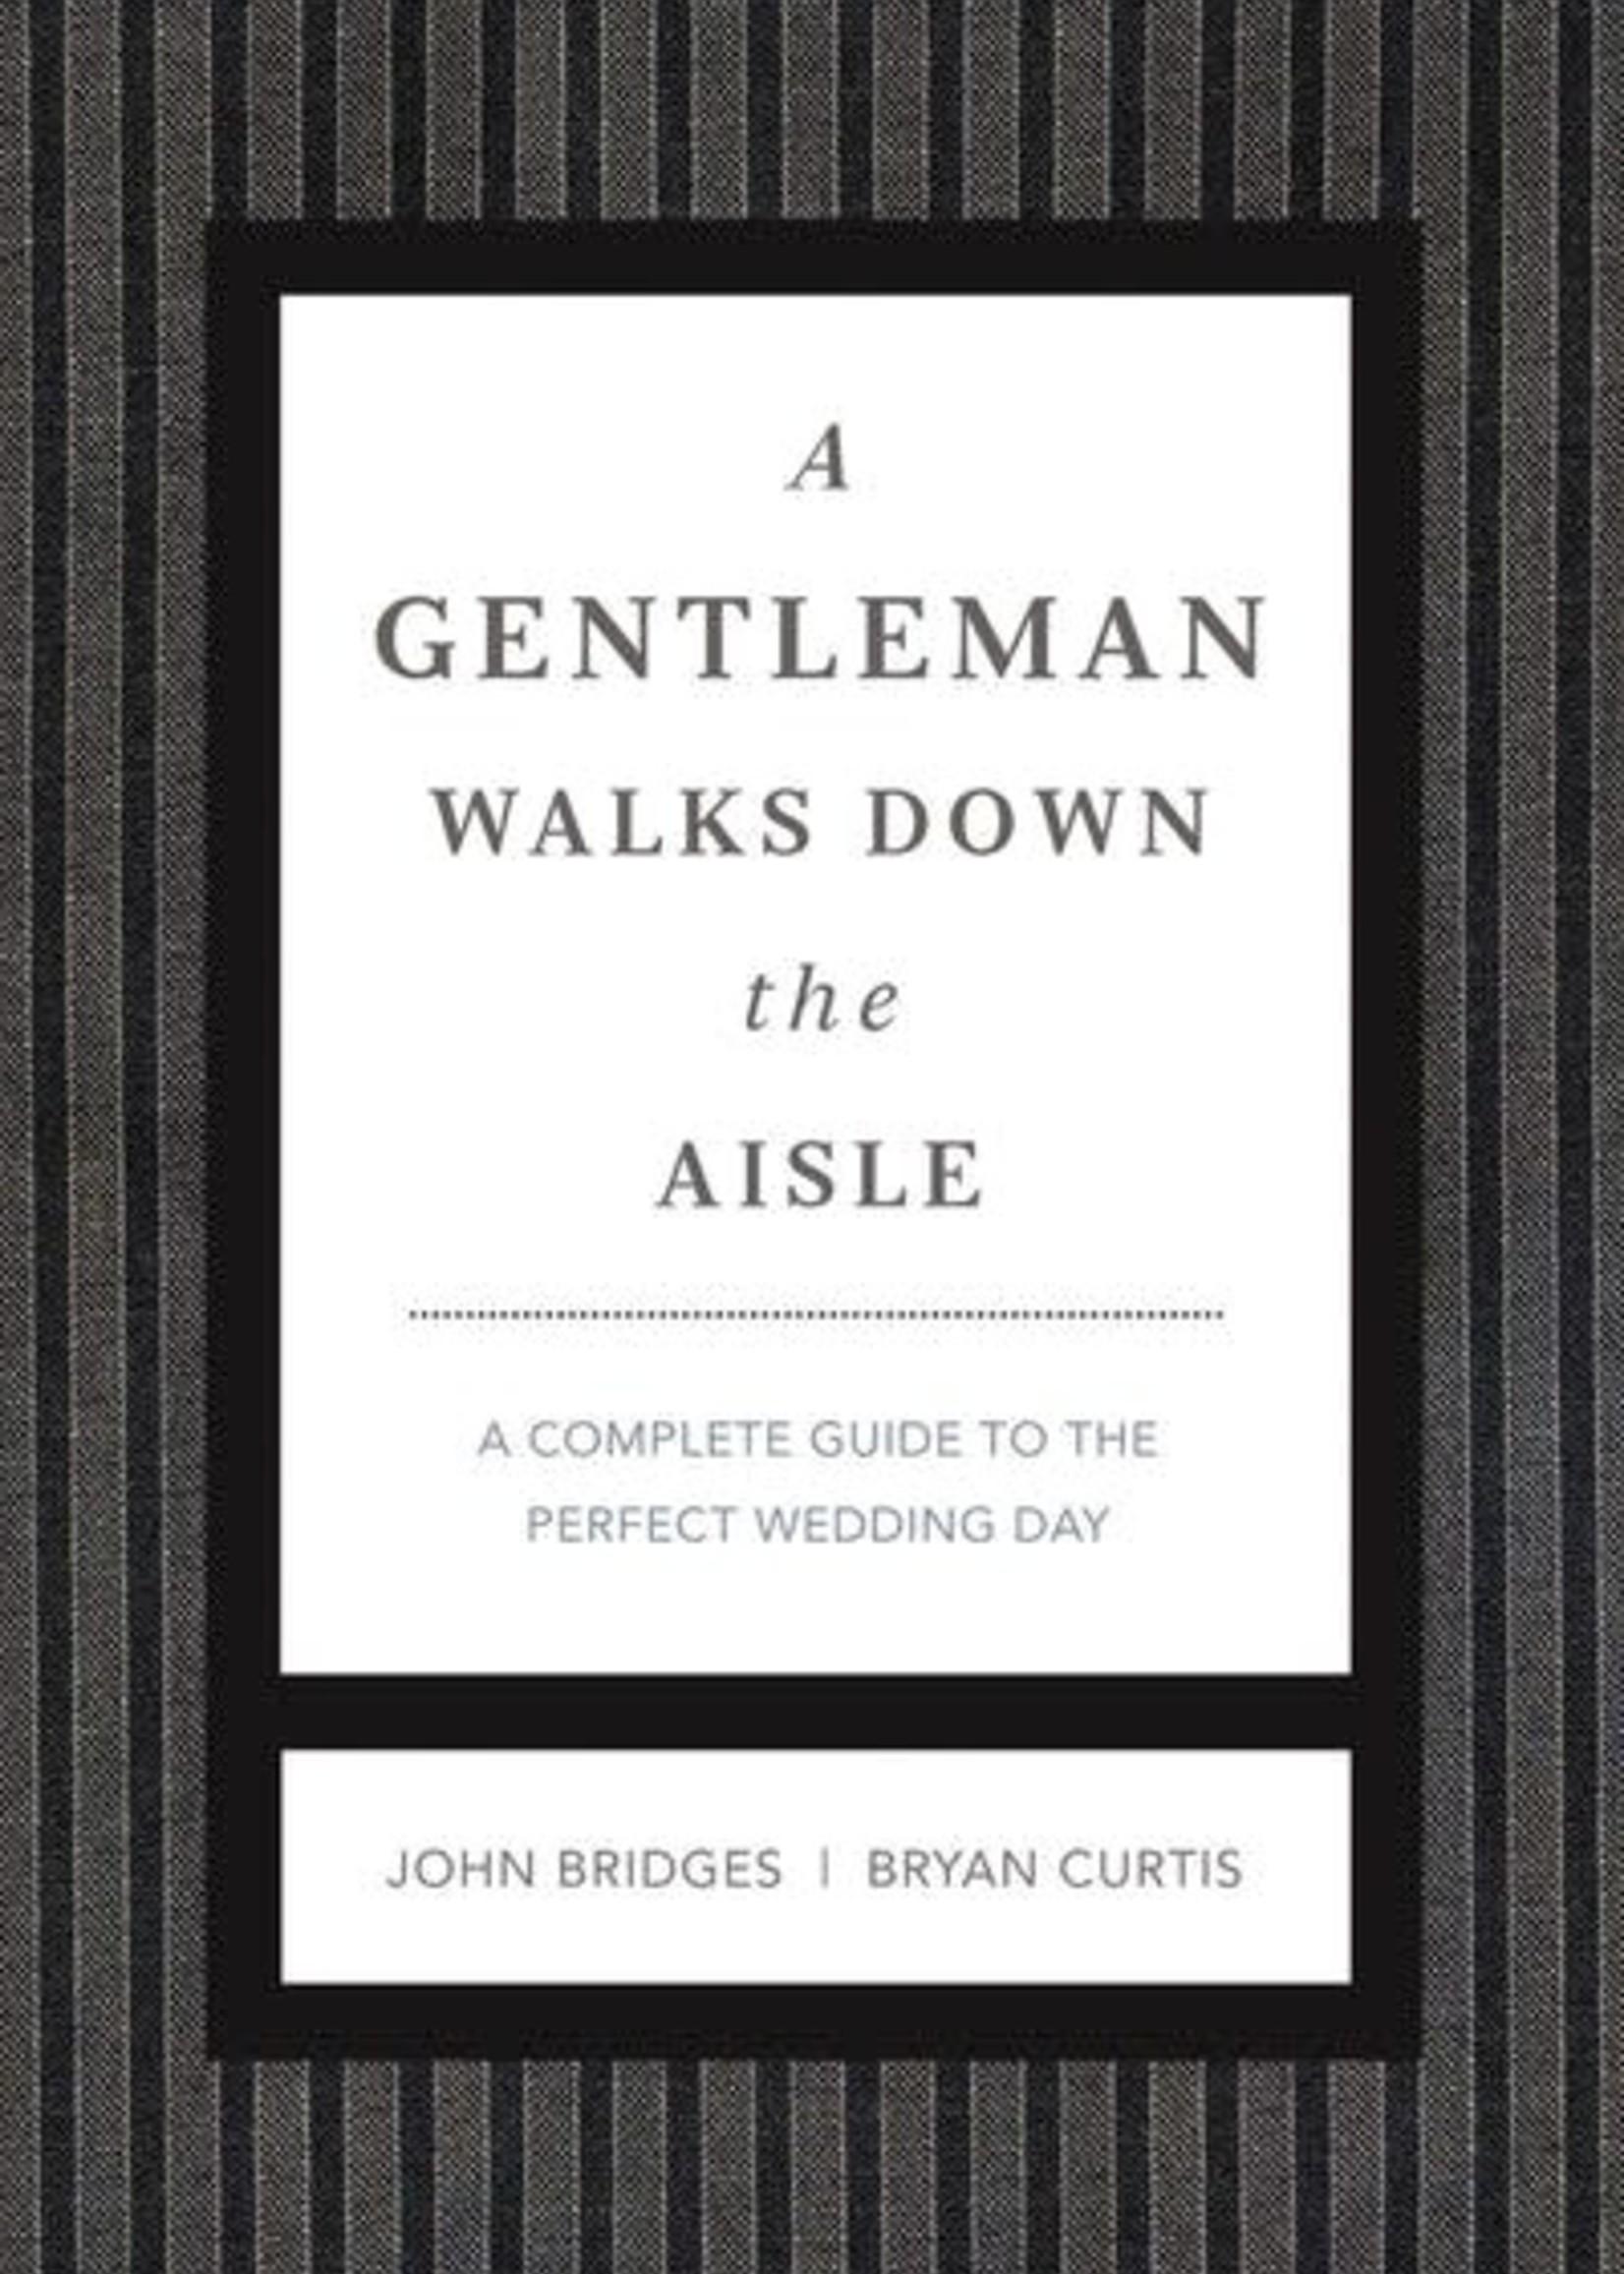 A Gentleman Walks Down The Isle